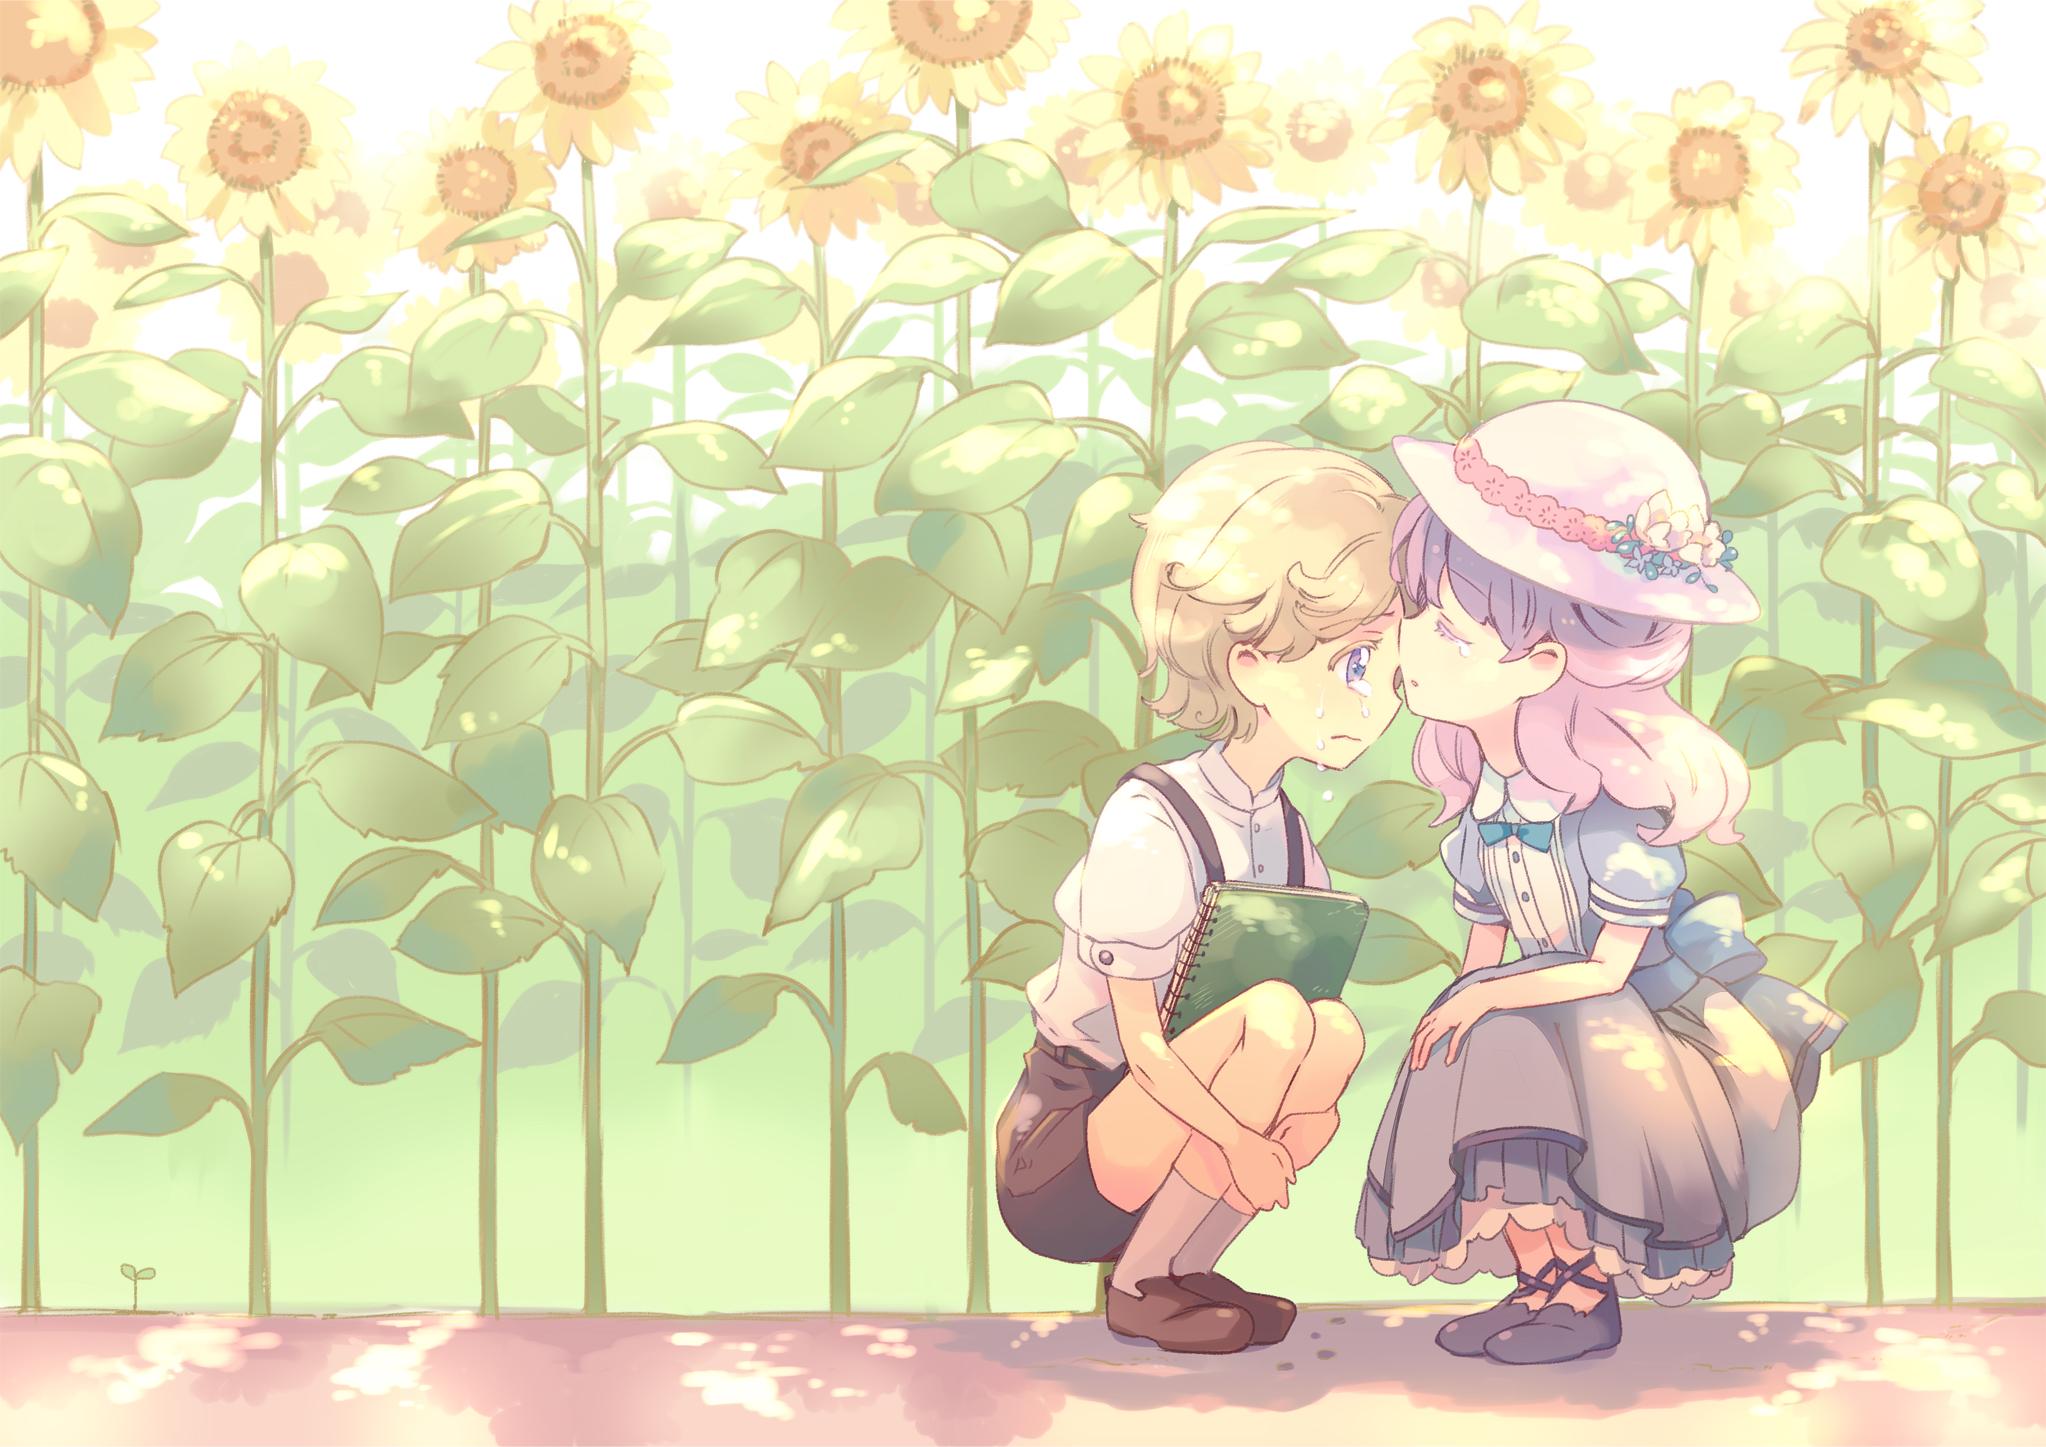 Anime Kid Crouching